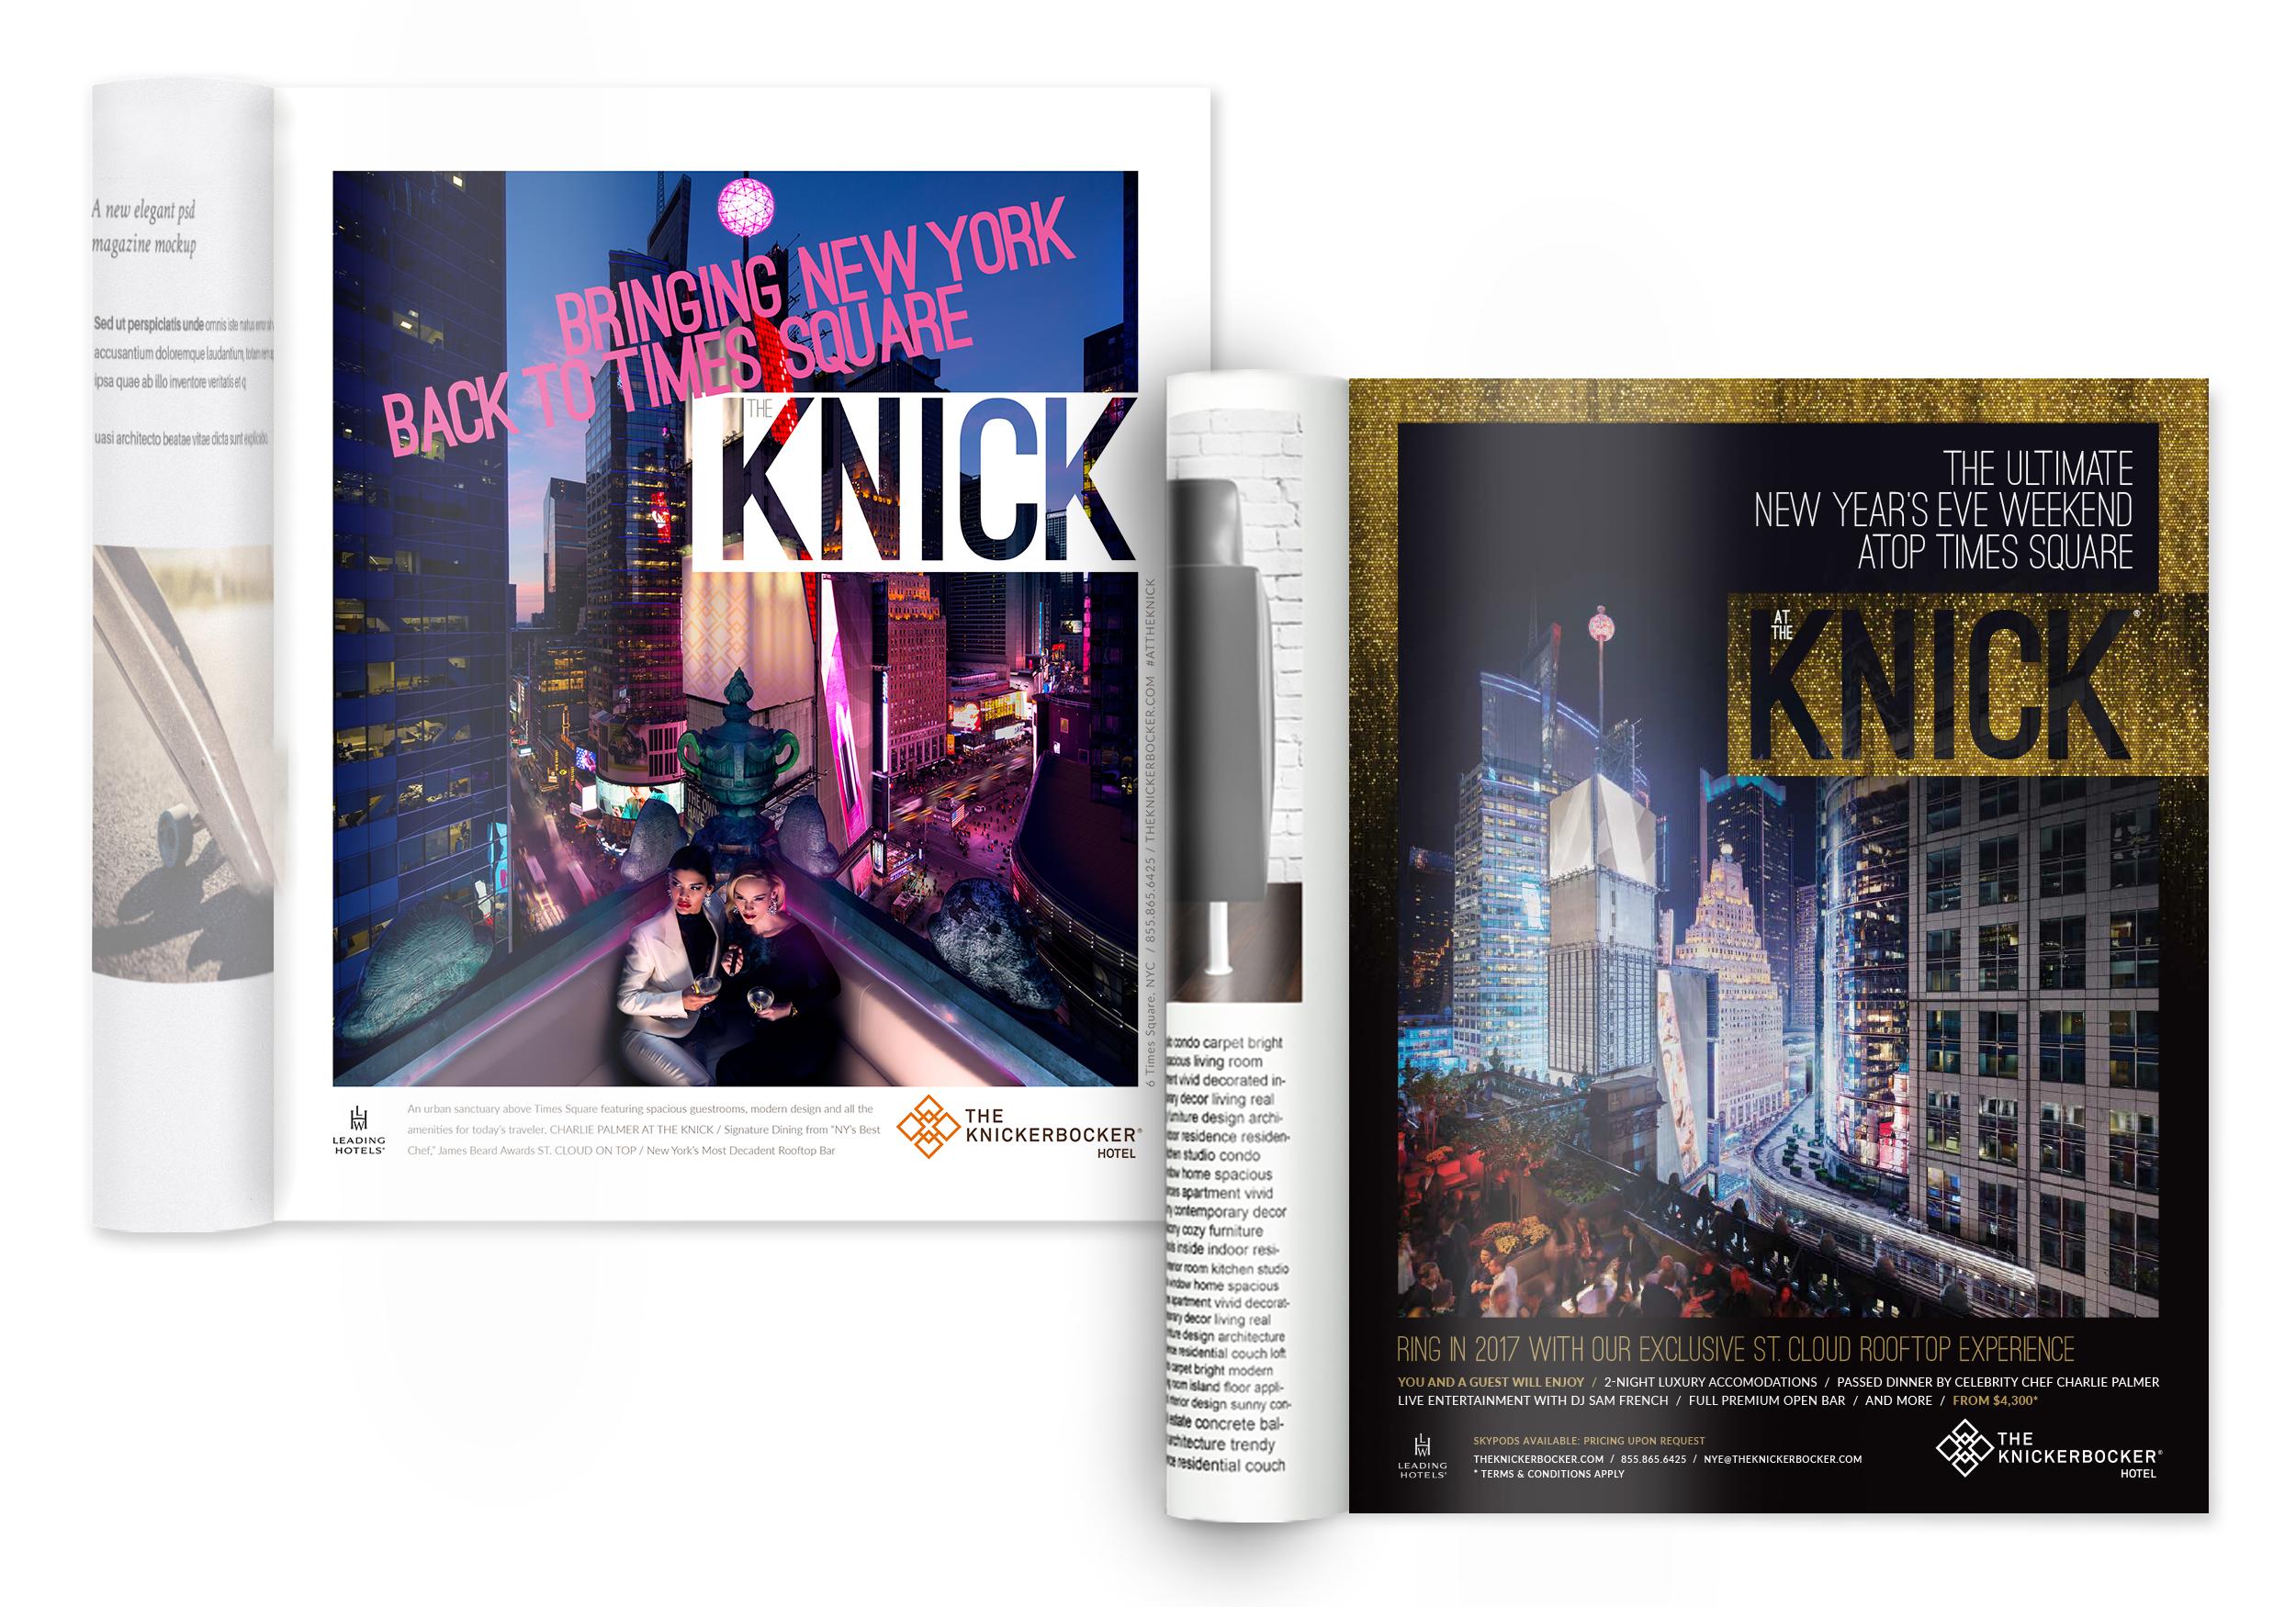 Knick_Print_03.png